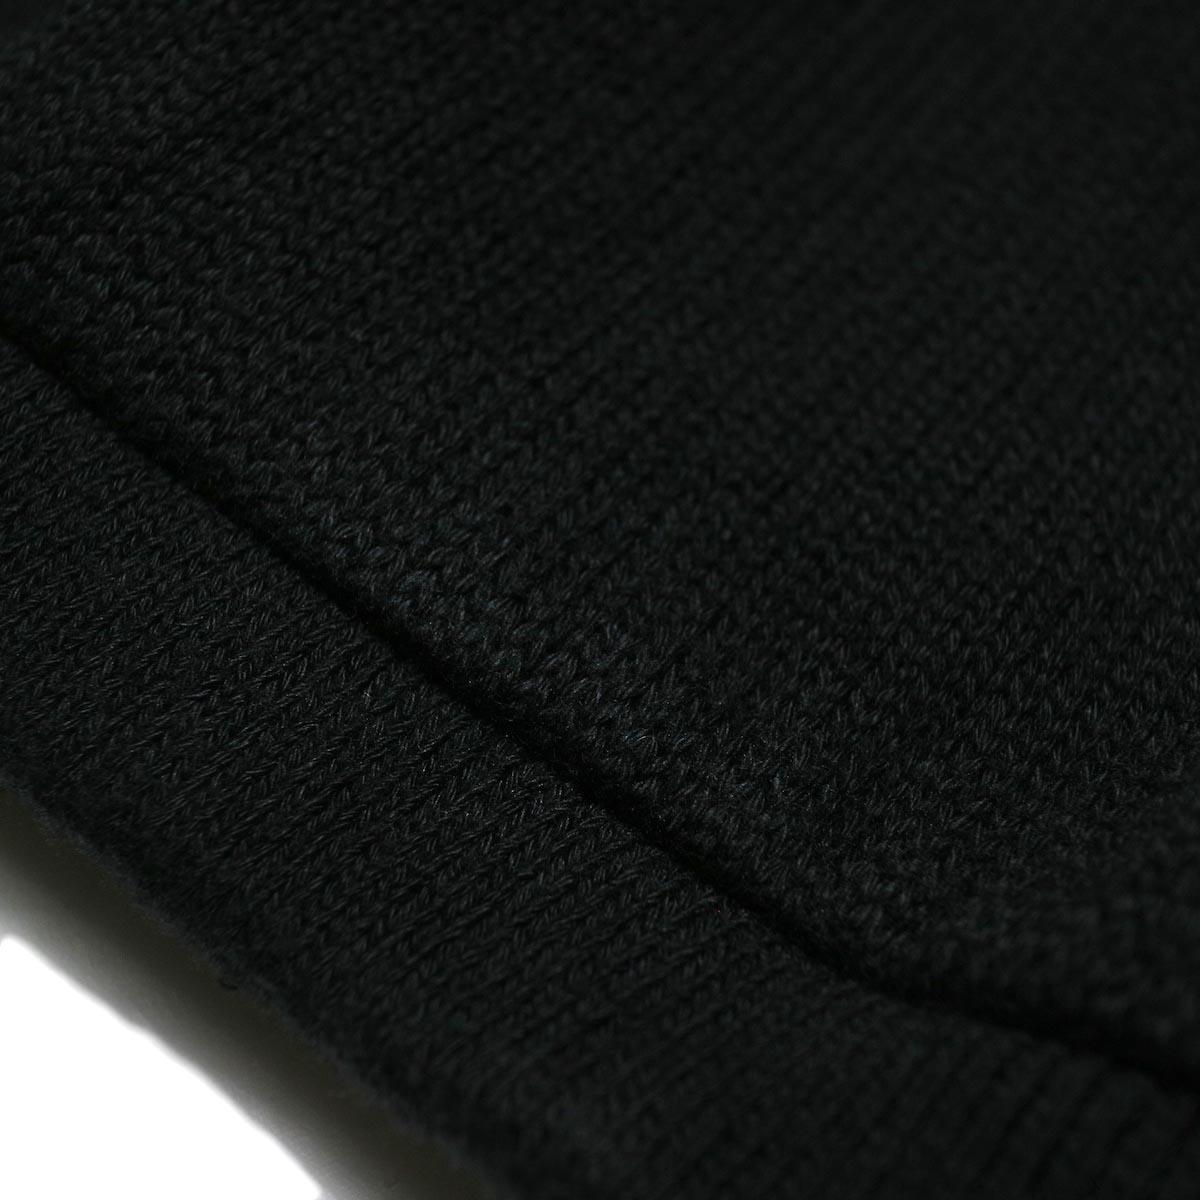 alvana / RIB KNIT CREWNECK P/O (Black) 生地アップ